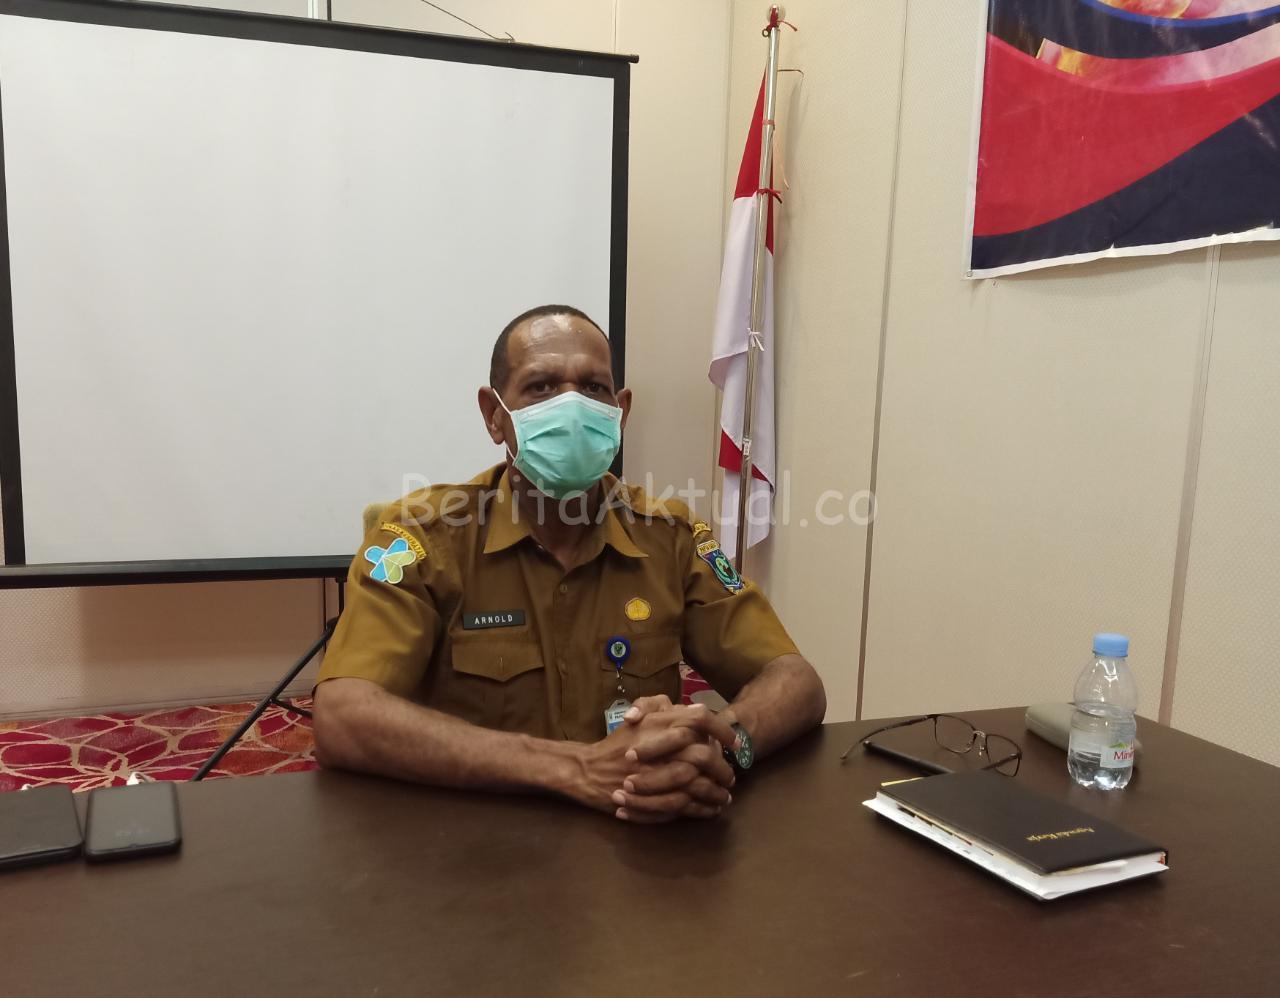 Sampai Hari ini Senin 4 Mei, Papua Barat Tidak Ada Penambahan Pasien Positif 25 IMG 20200504 WA0045